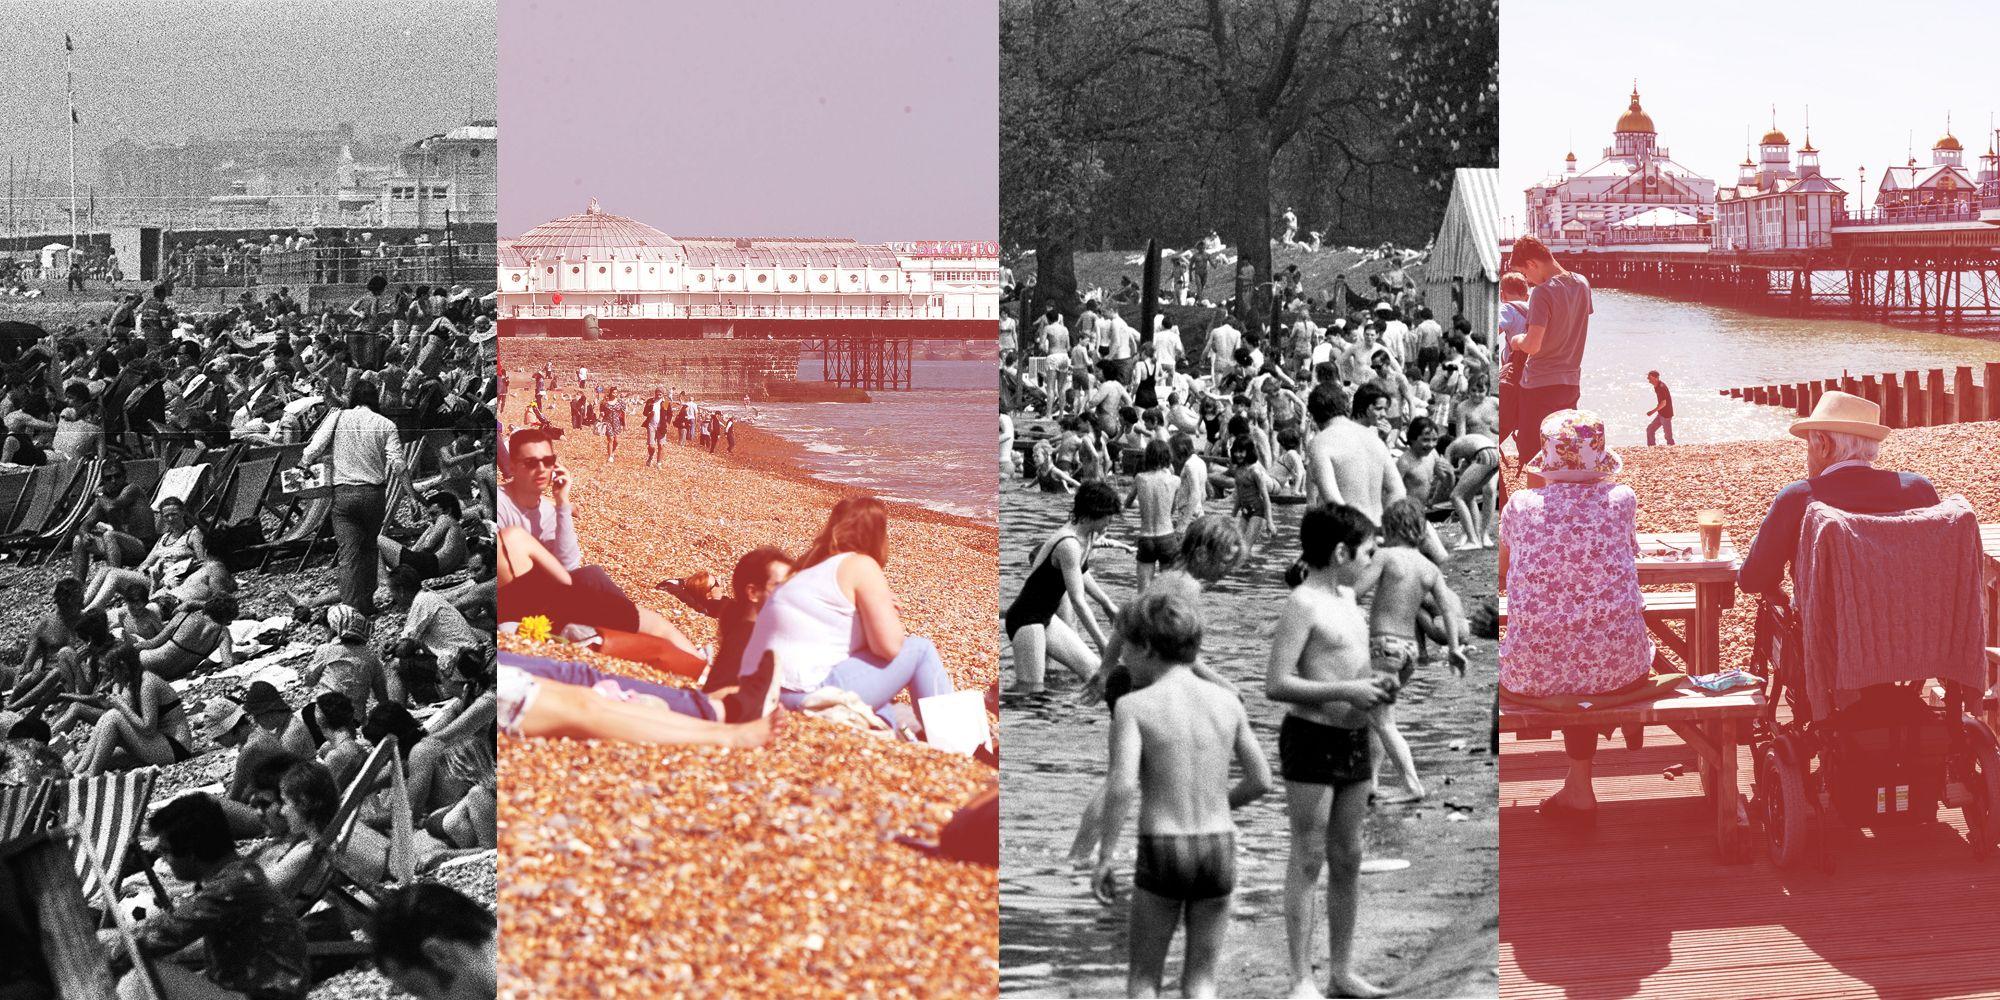 UK heatwave 2018 and 1976